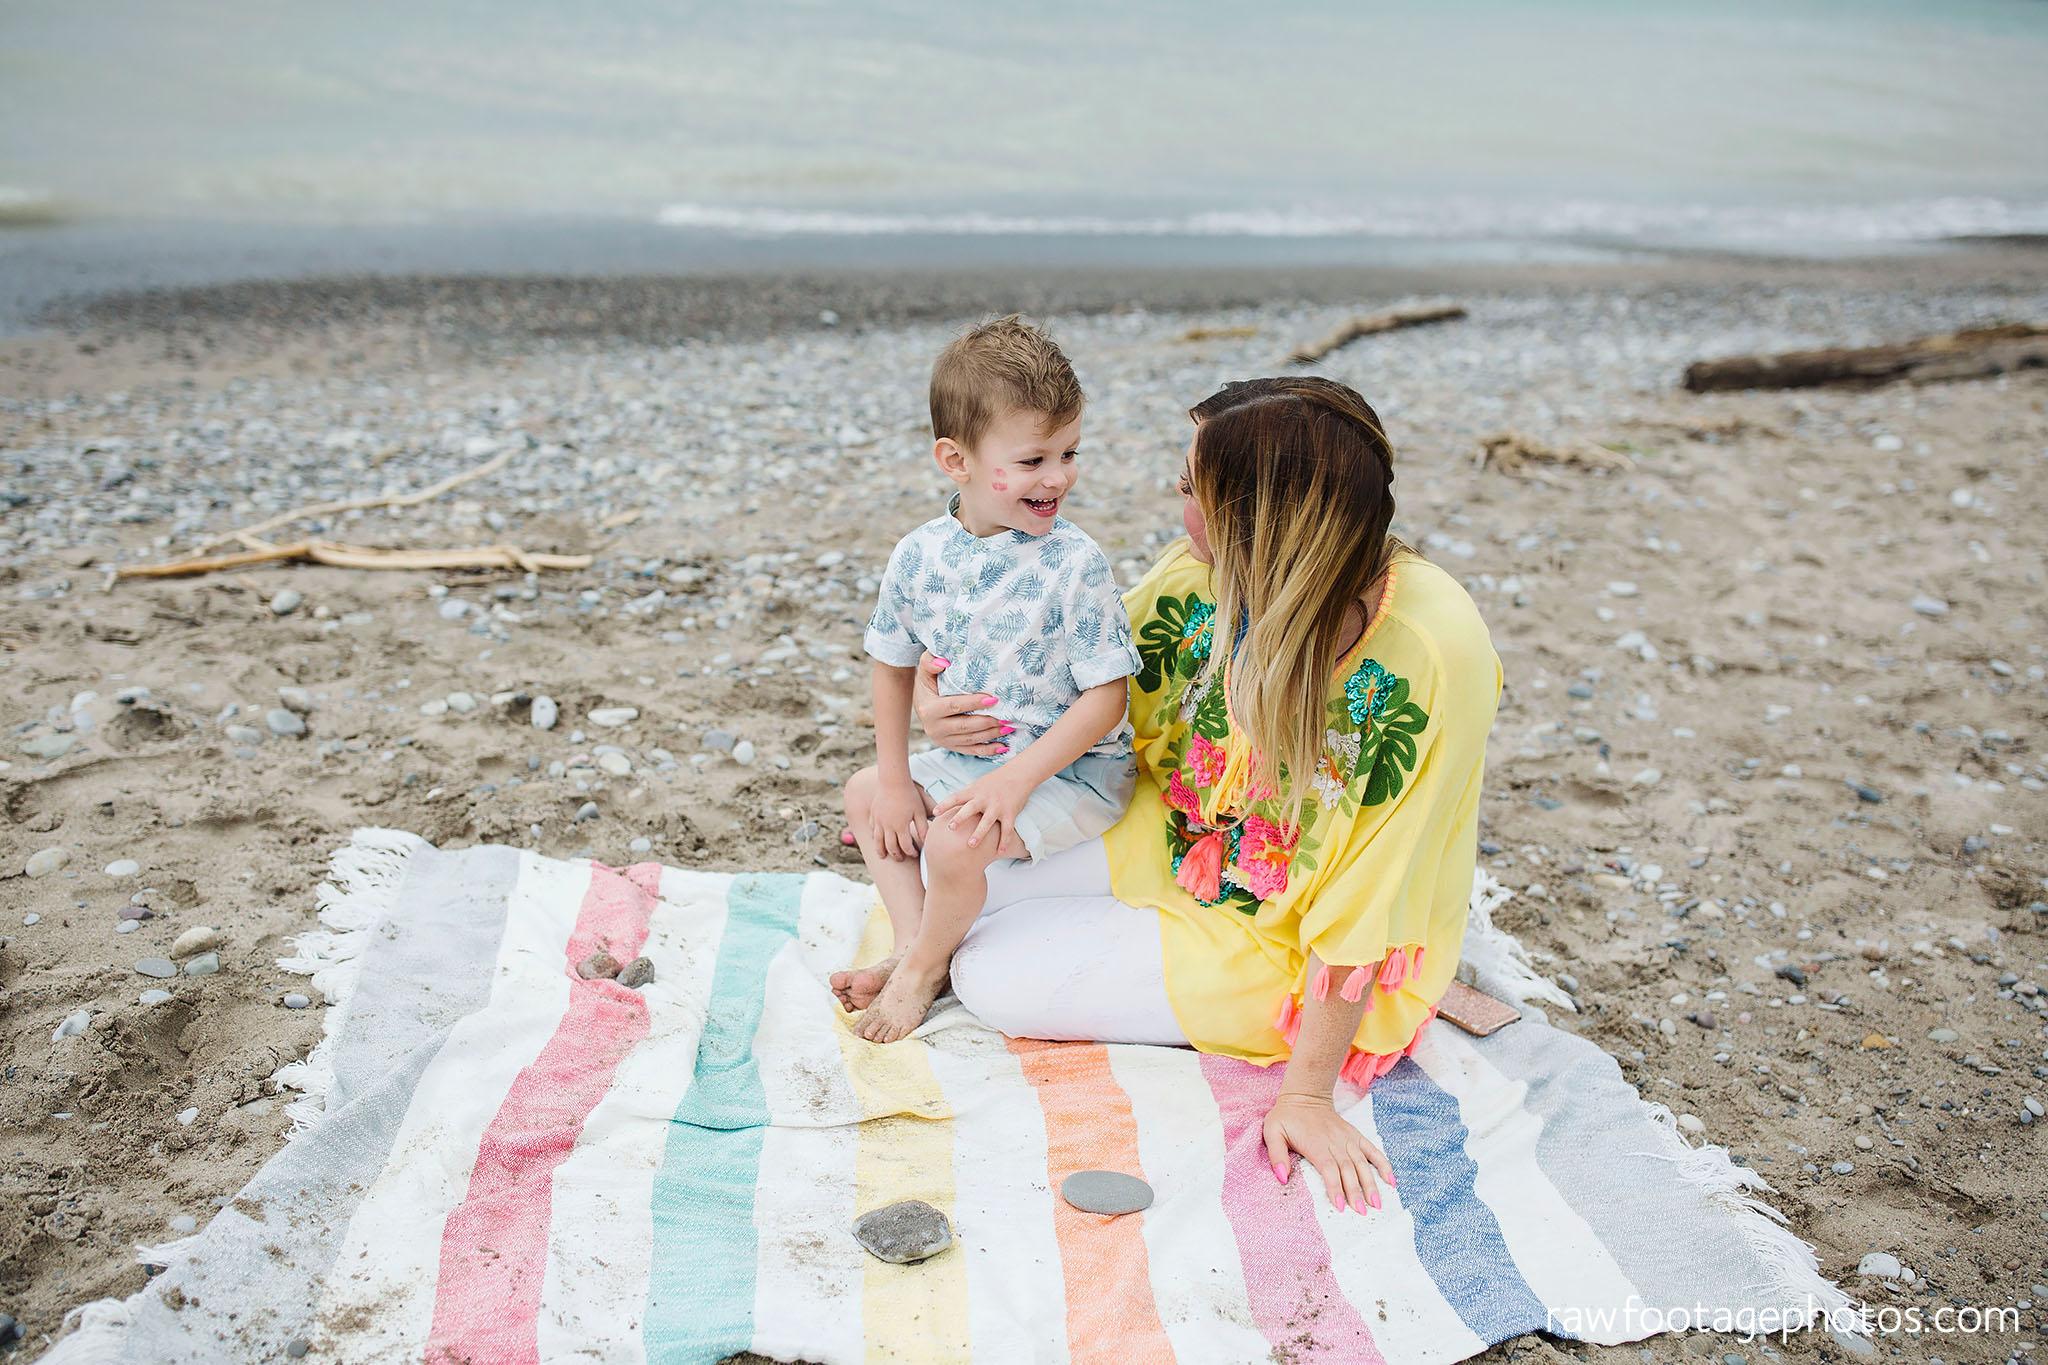 london_ontario_photographer-raw_footage_photography-beach_minis-port_stanley_beach-family_photographer-couple_photographer-lifestyle_photographer010.jpg